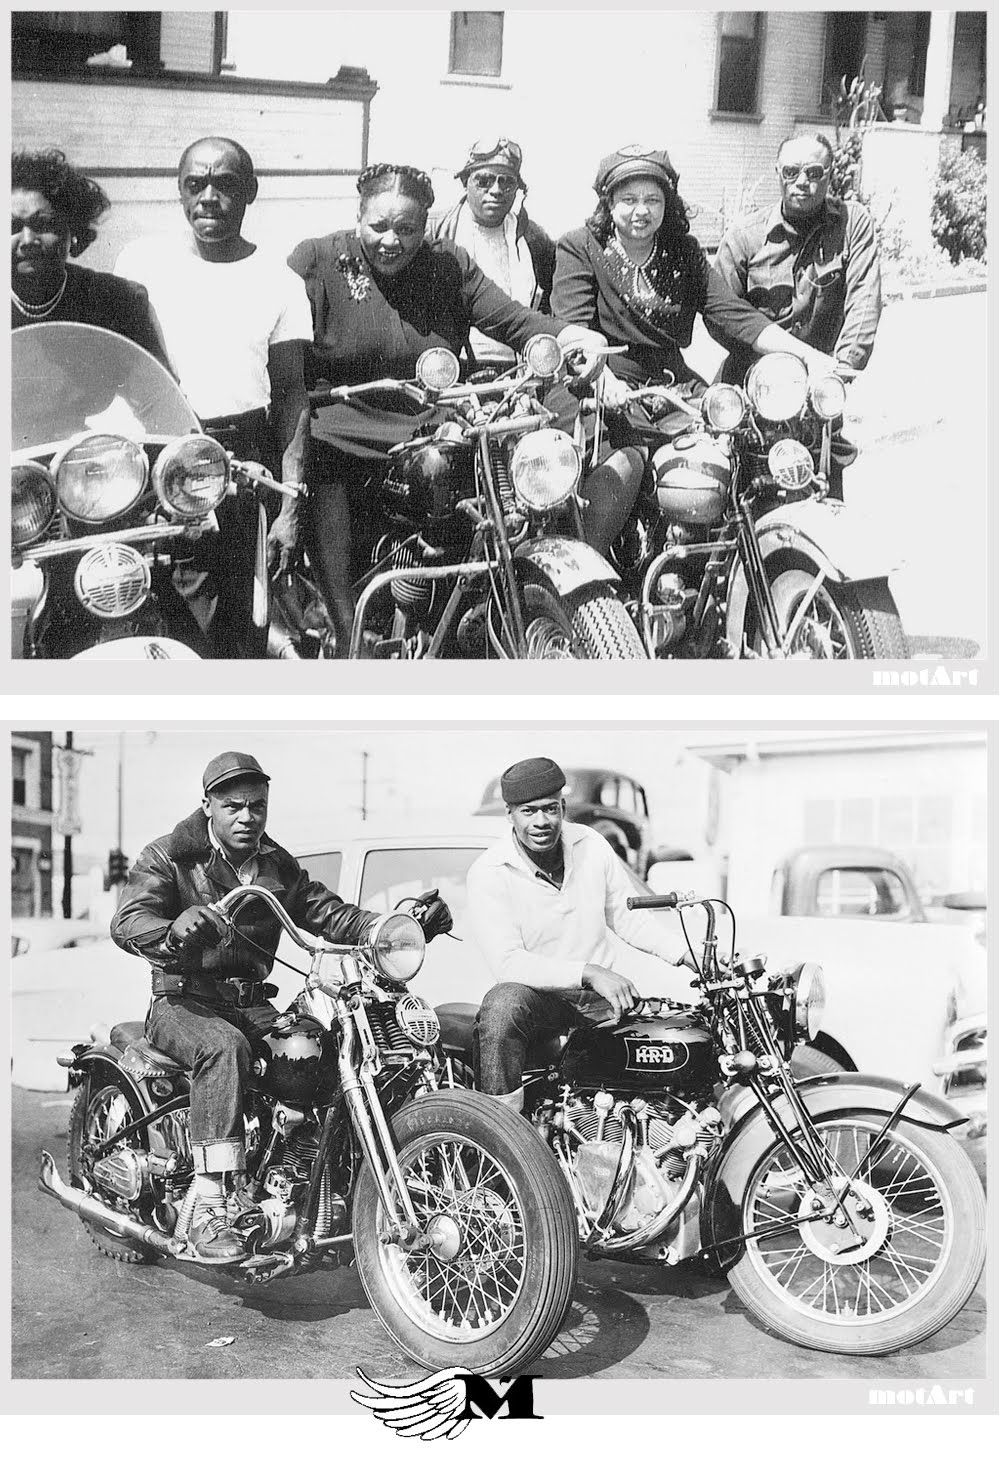 Pin by Stephen McClinton Jr on African American Harley ...  |African American Harley Riders